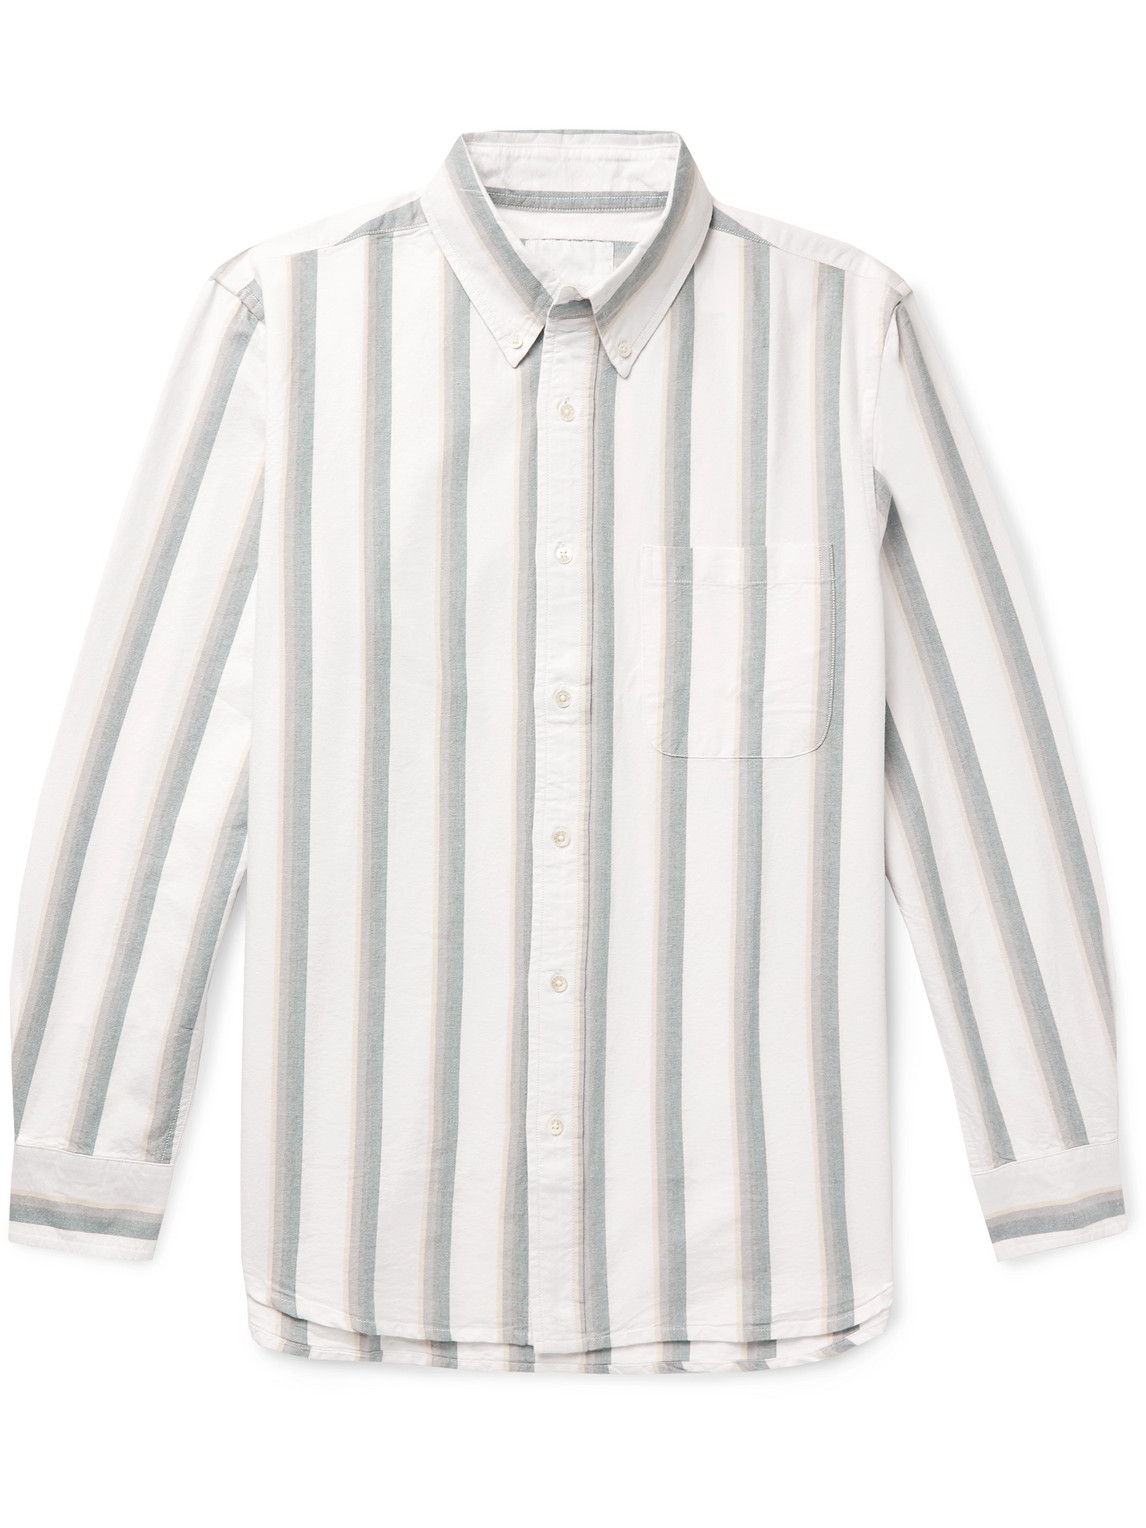 Adsum Button-down Collar Striped Cotton Oxford Shirt In White